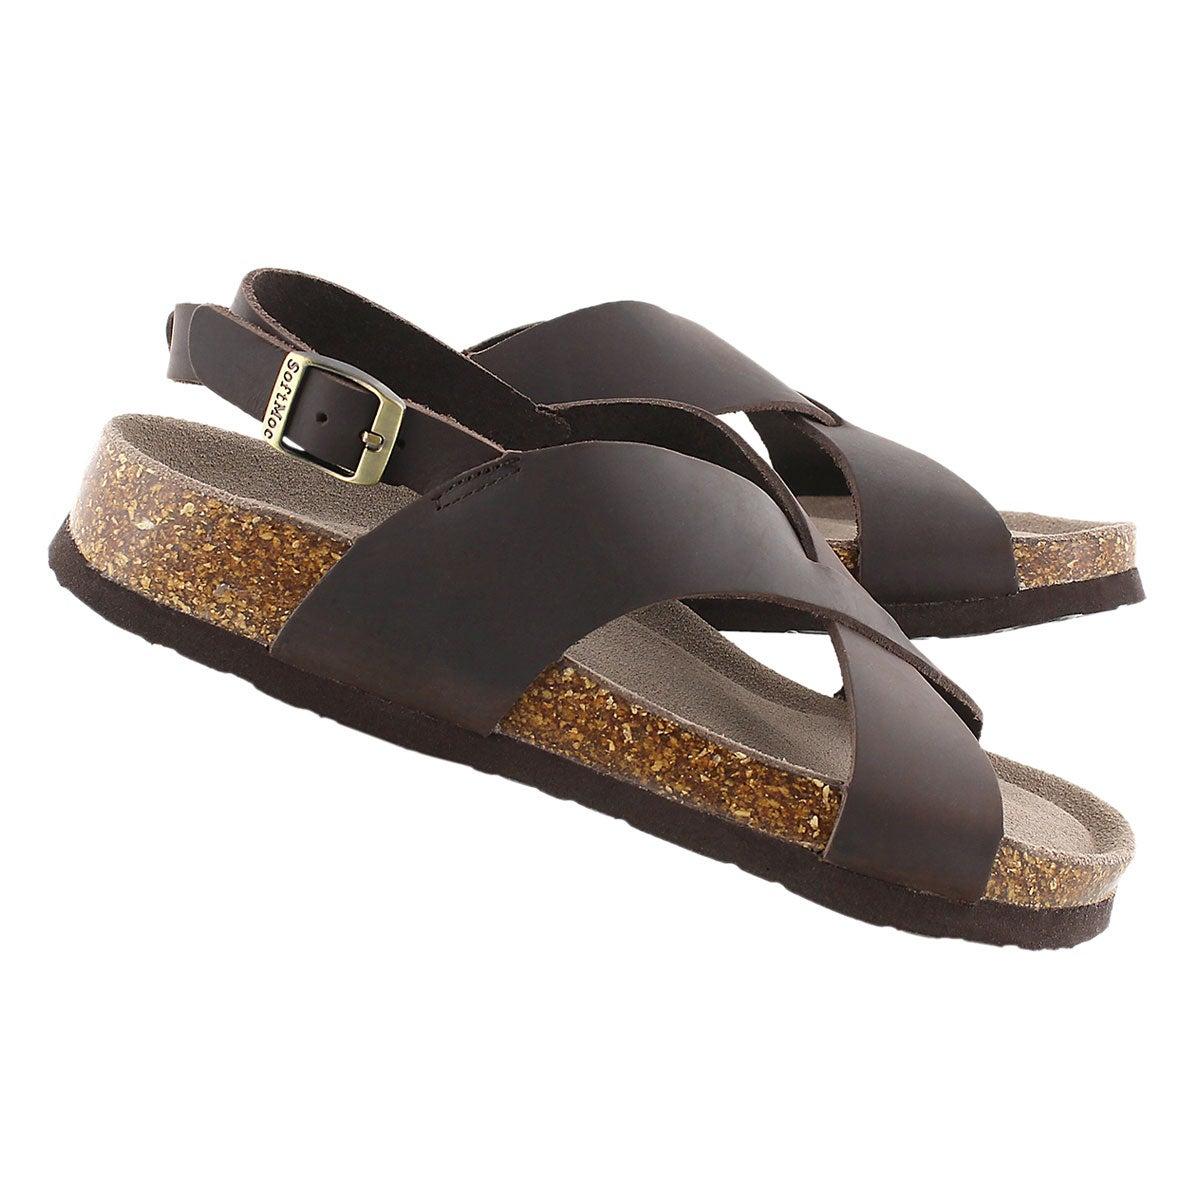 Lds Addy brown crzy memory foam sandal